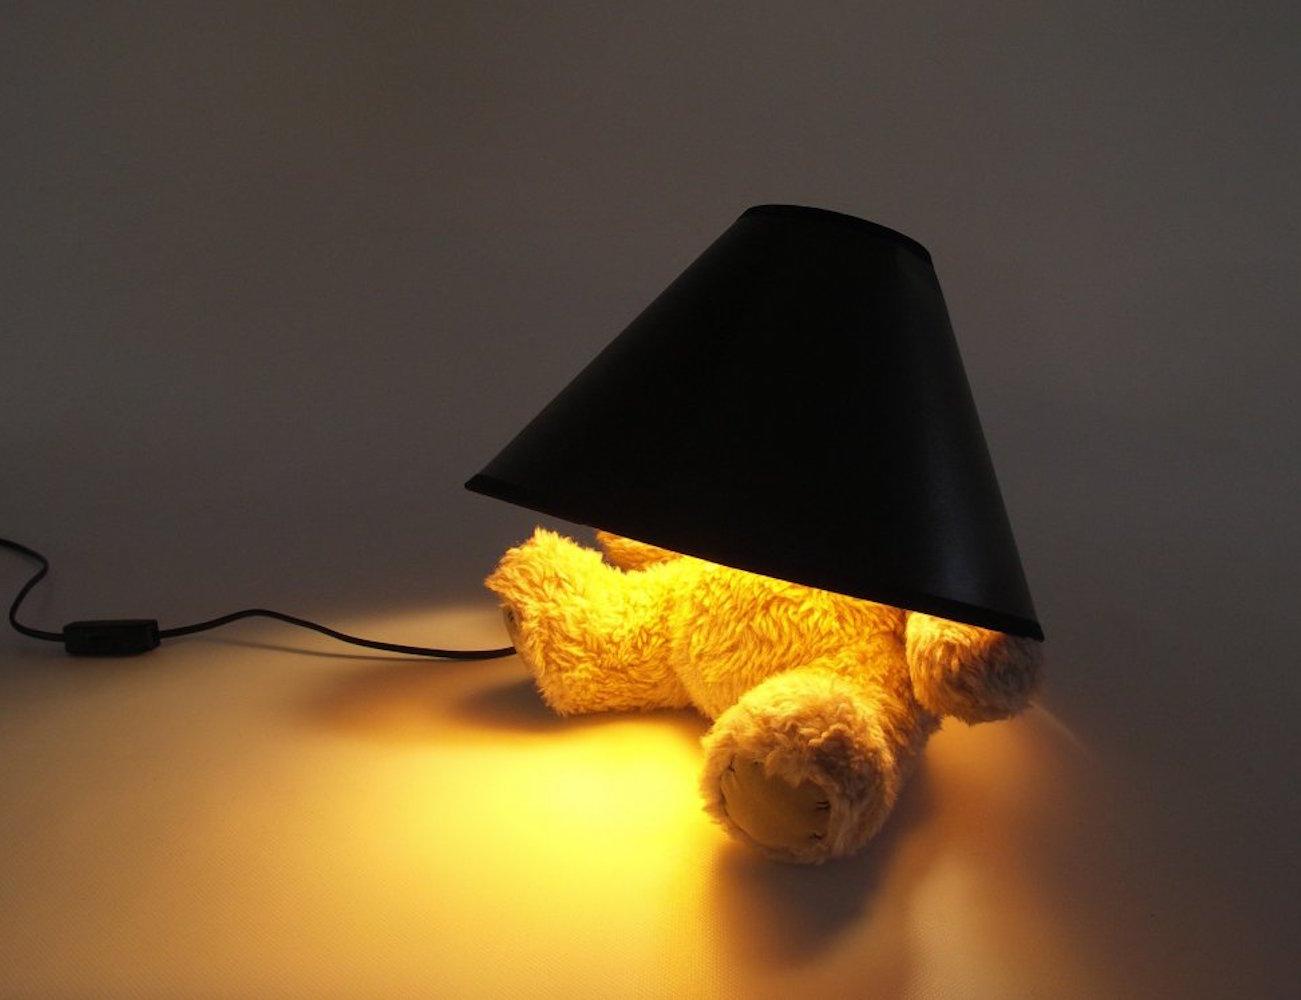 teddy-bear-lamp-from-suck-uk-new-03